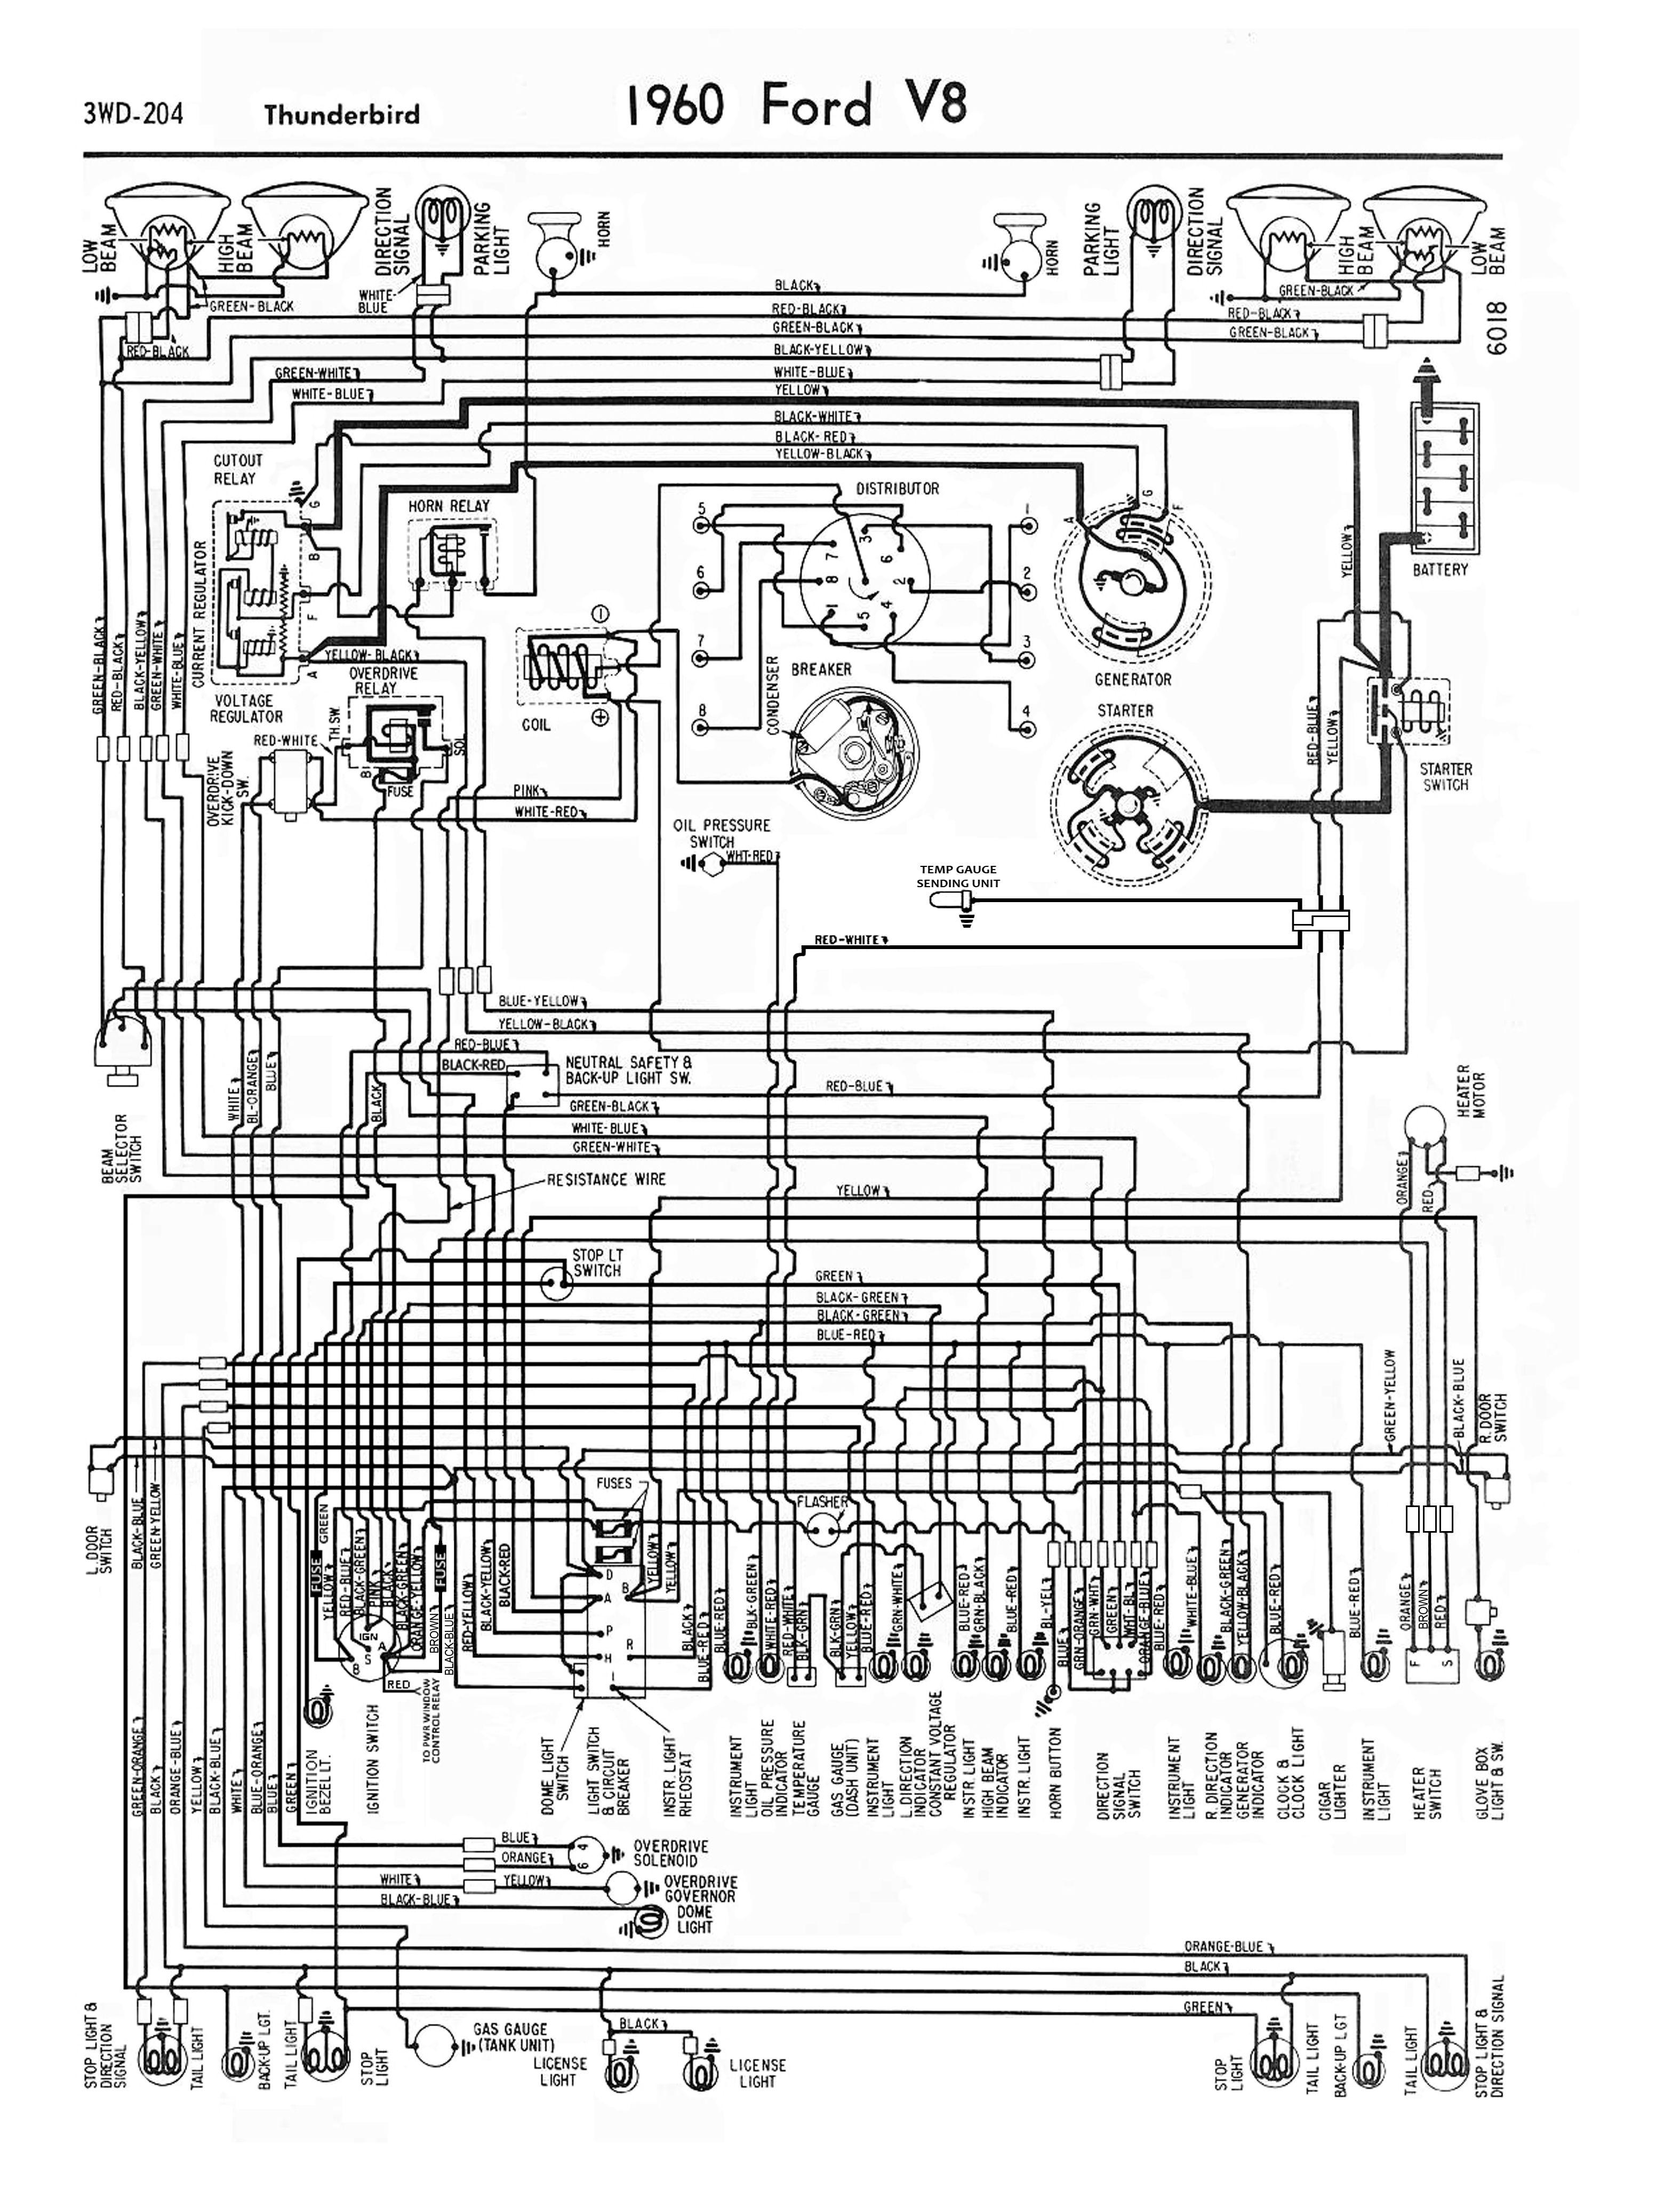 60 Tbird Wiring Diagram | Squarebird | Ford thunderbird